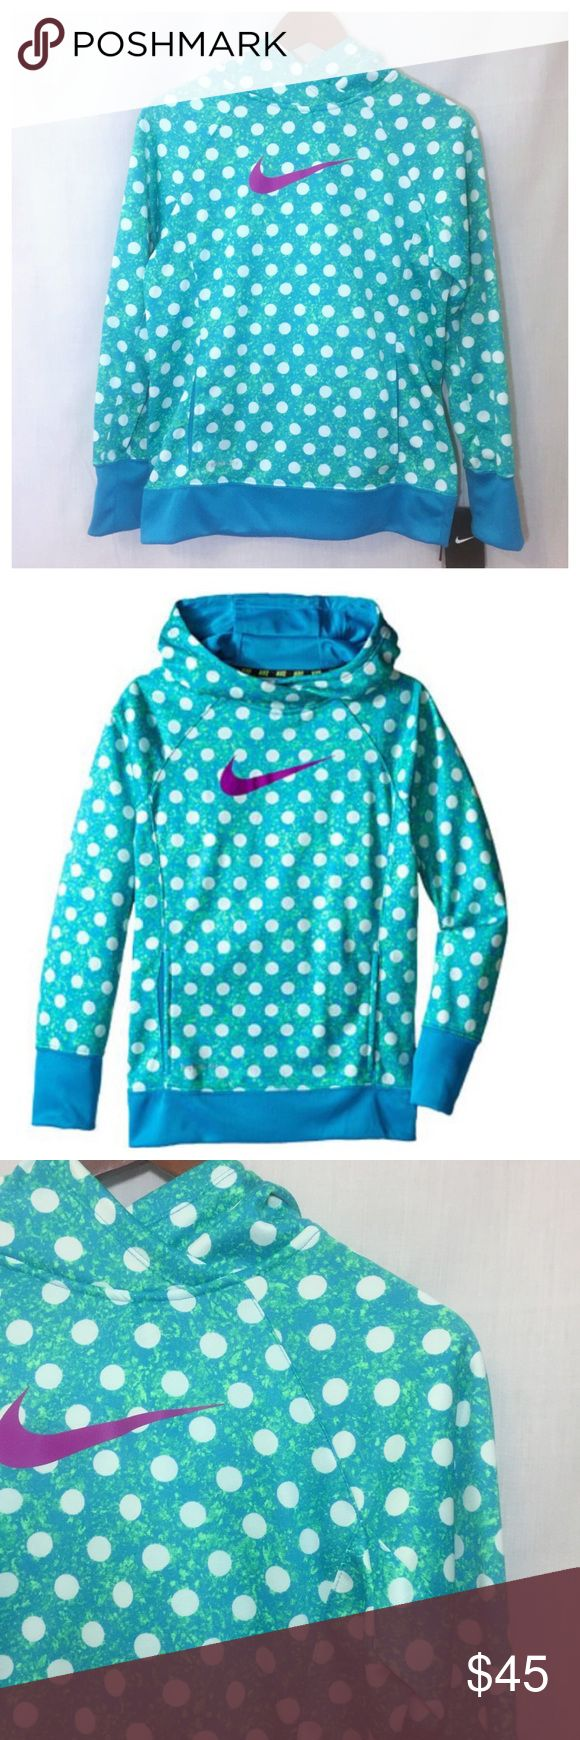 "Girl's Nike Hoodie Therma Fit Blue Polka Dot Sz XL NWT Big Girl's Nike Hoodie Therma Fit Blue Polka Dot  • Sz XL • Therma fit helps keep you warm and insulated • Onseam kangaroo pockets • 19"" bust, measured flat • 24"" length • New with tags Nike Shirts & Tops Sweatshirts & Hoodies"